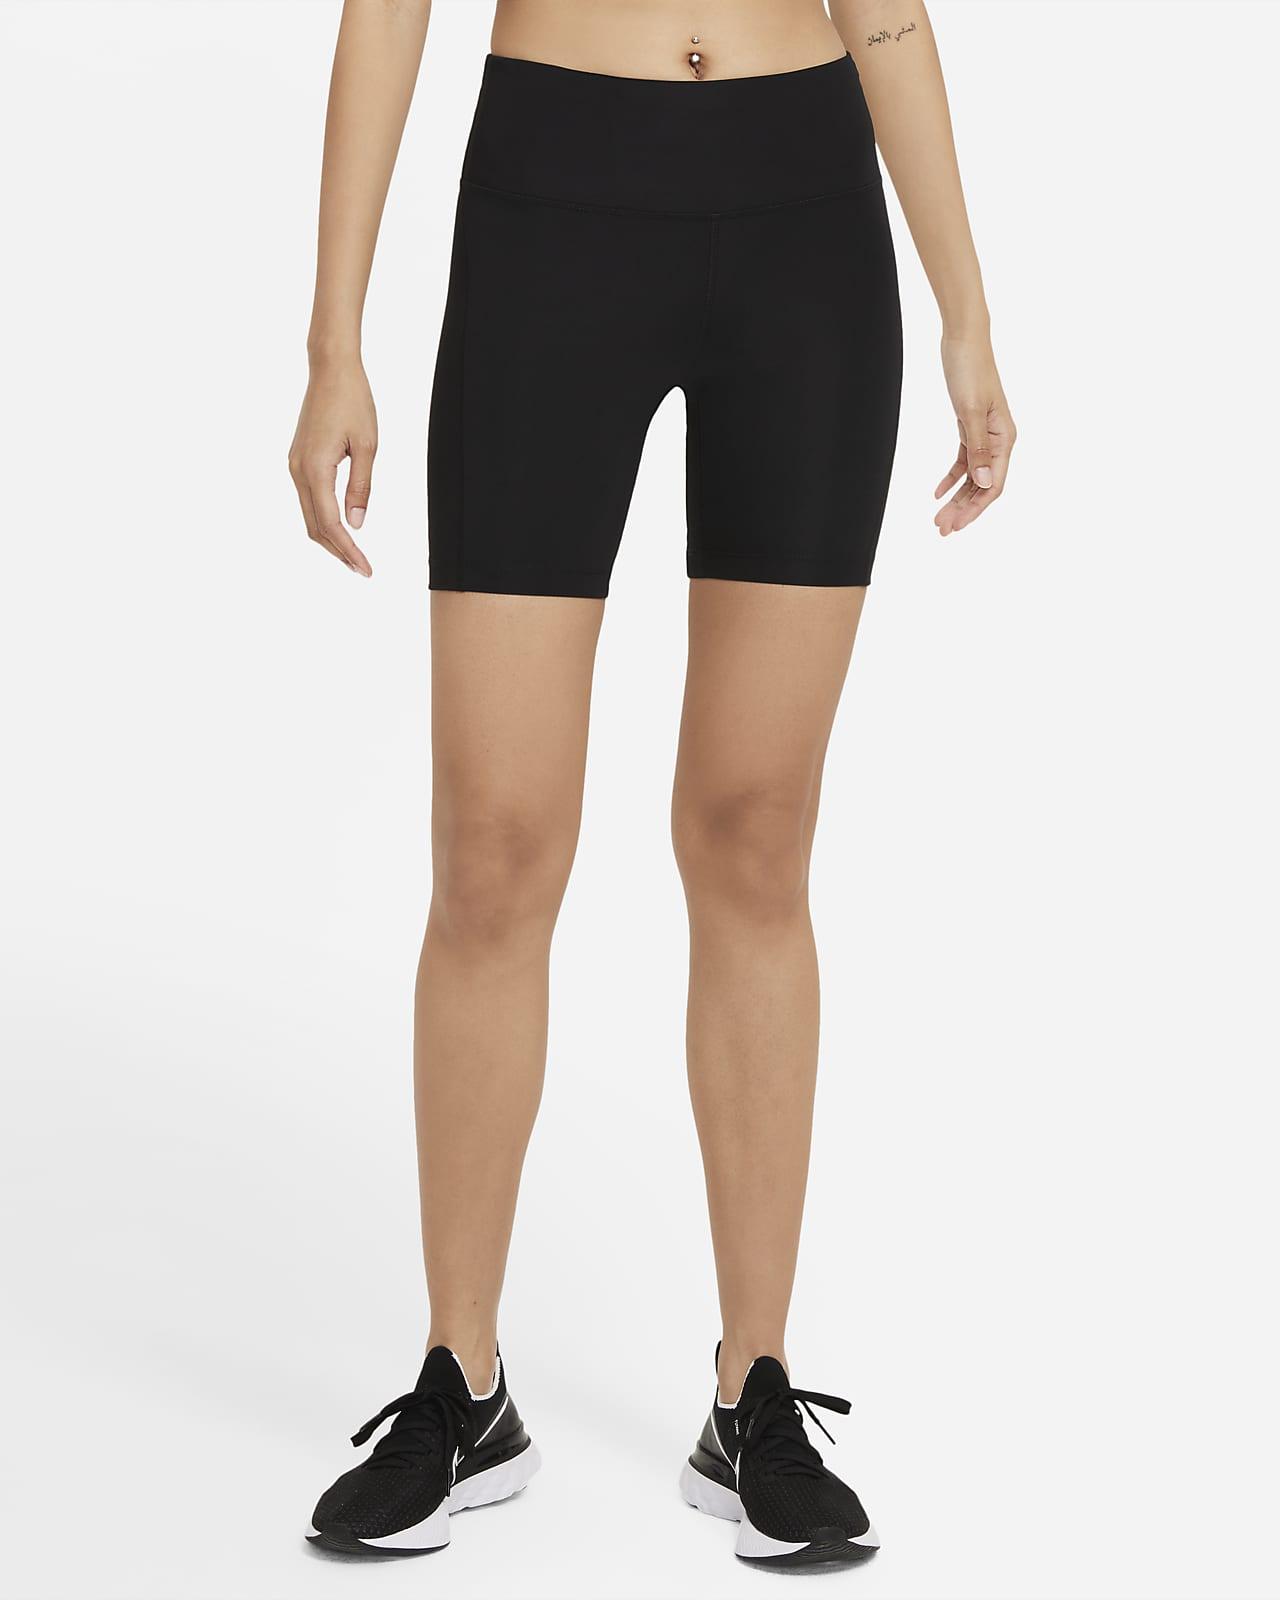 Nike Dri-FIT Fast Women's 18cm (approx.) Mid-Rise Running Shorts